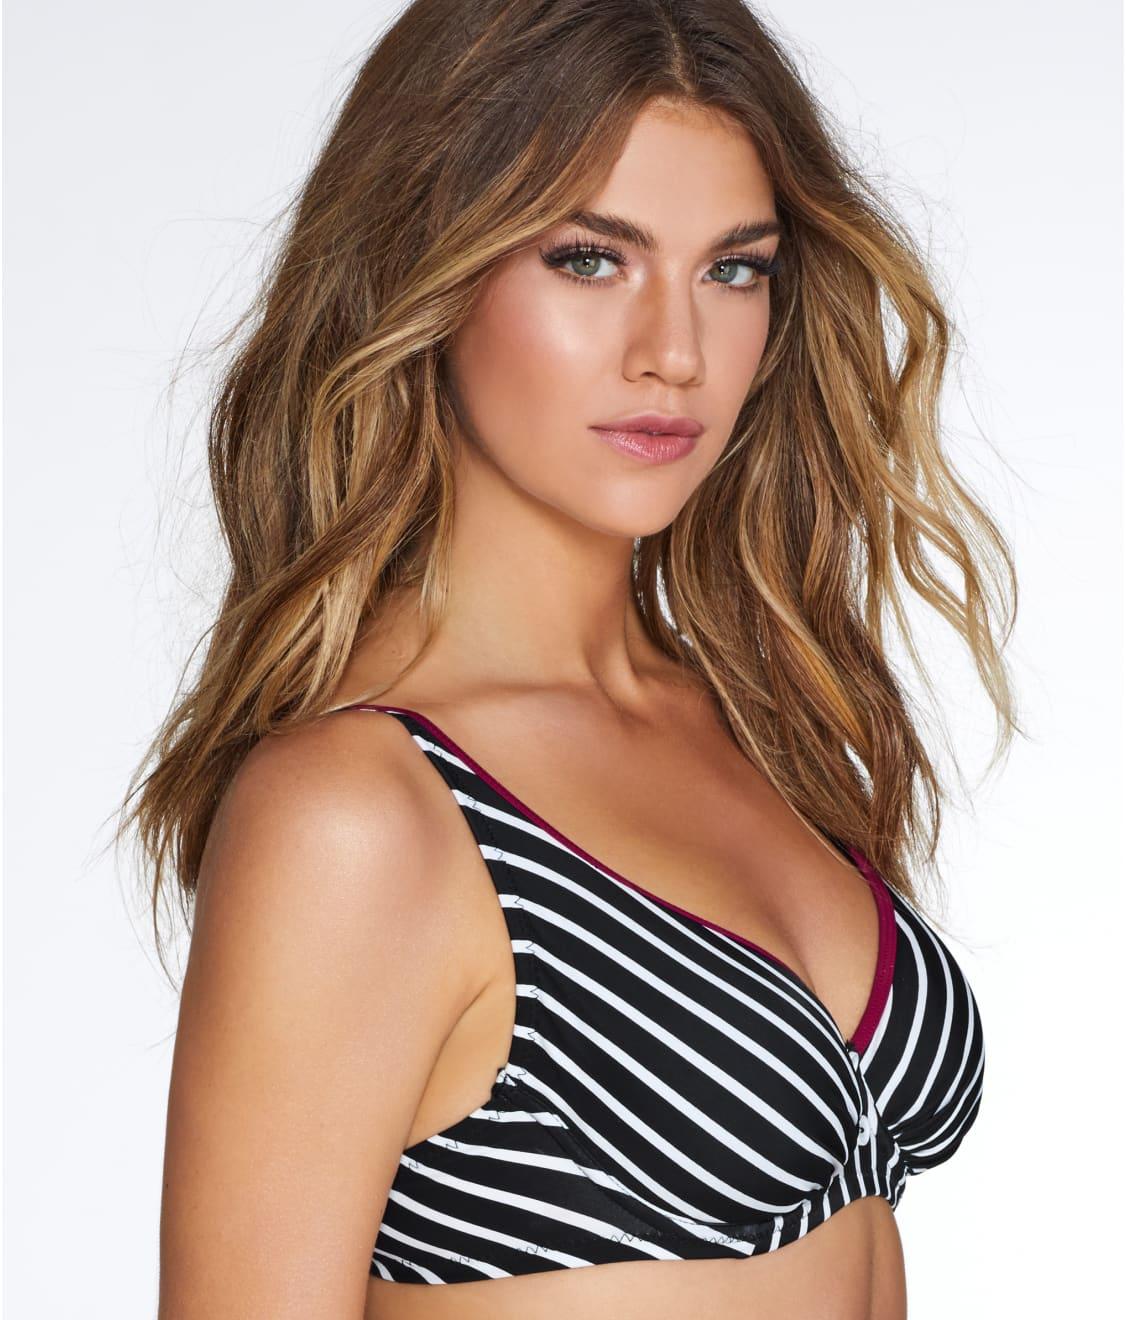 ff9d3961ab Pour Moi Starboard Bikini Top | Bare Necessities (68012)